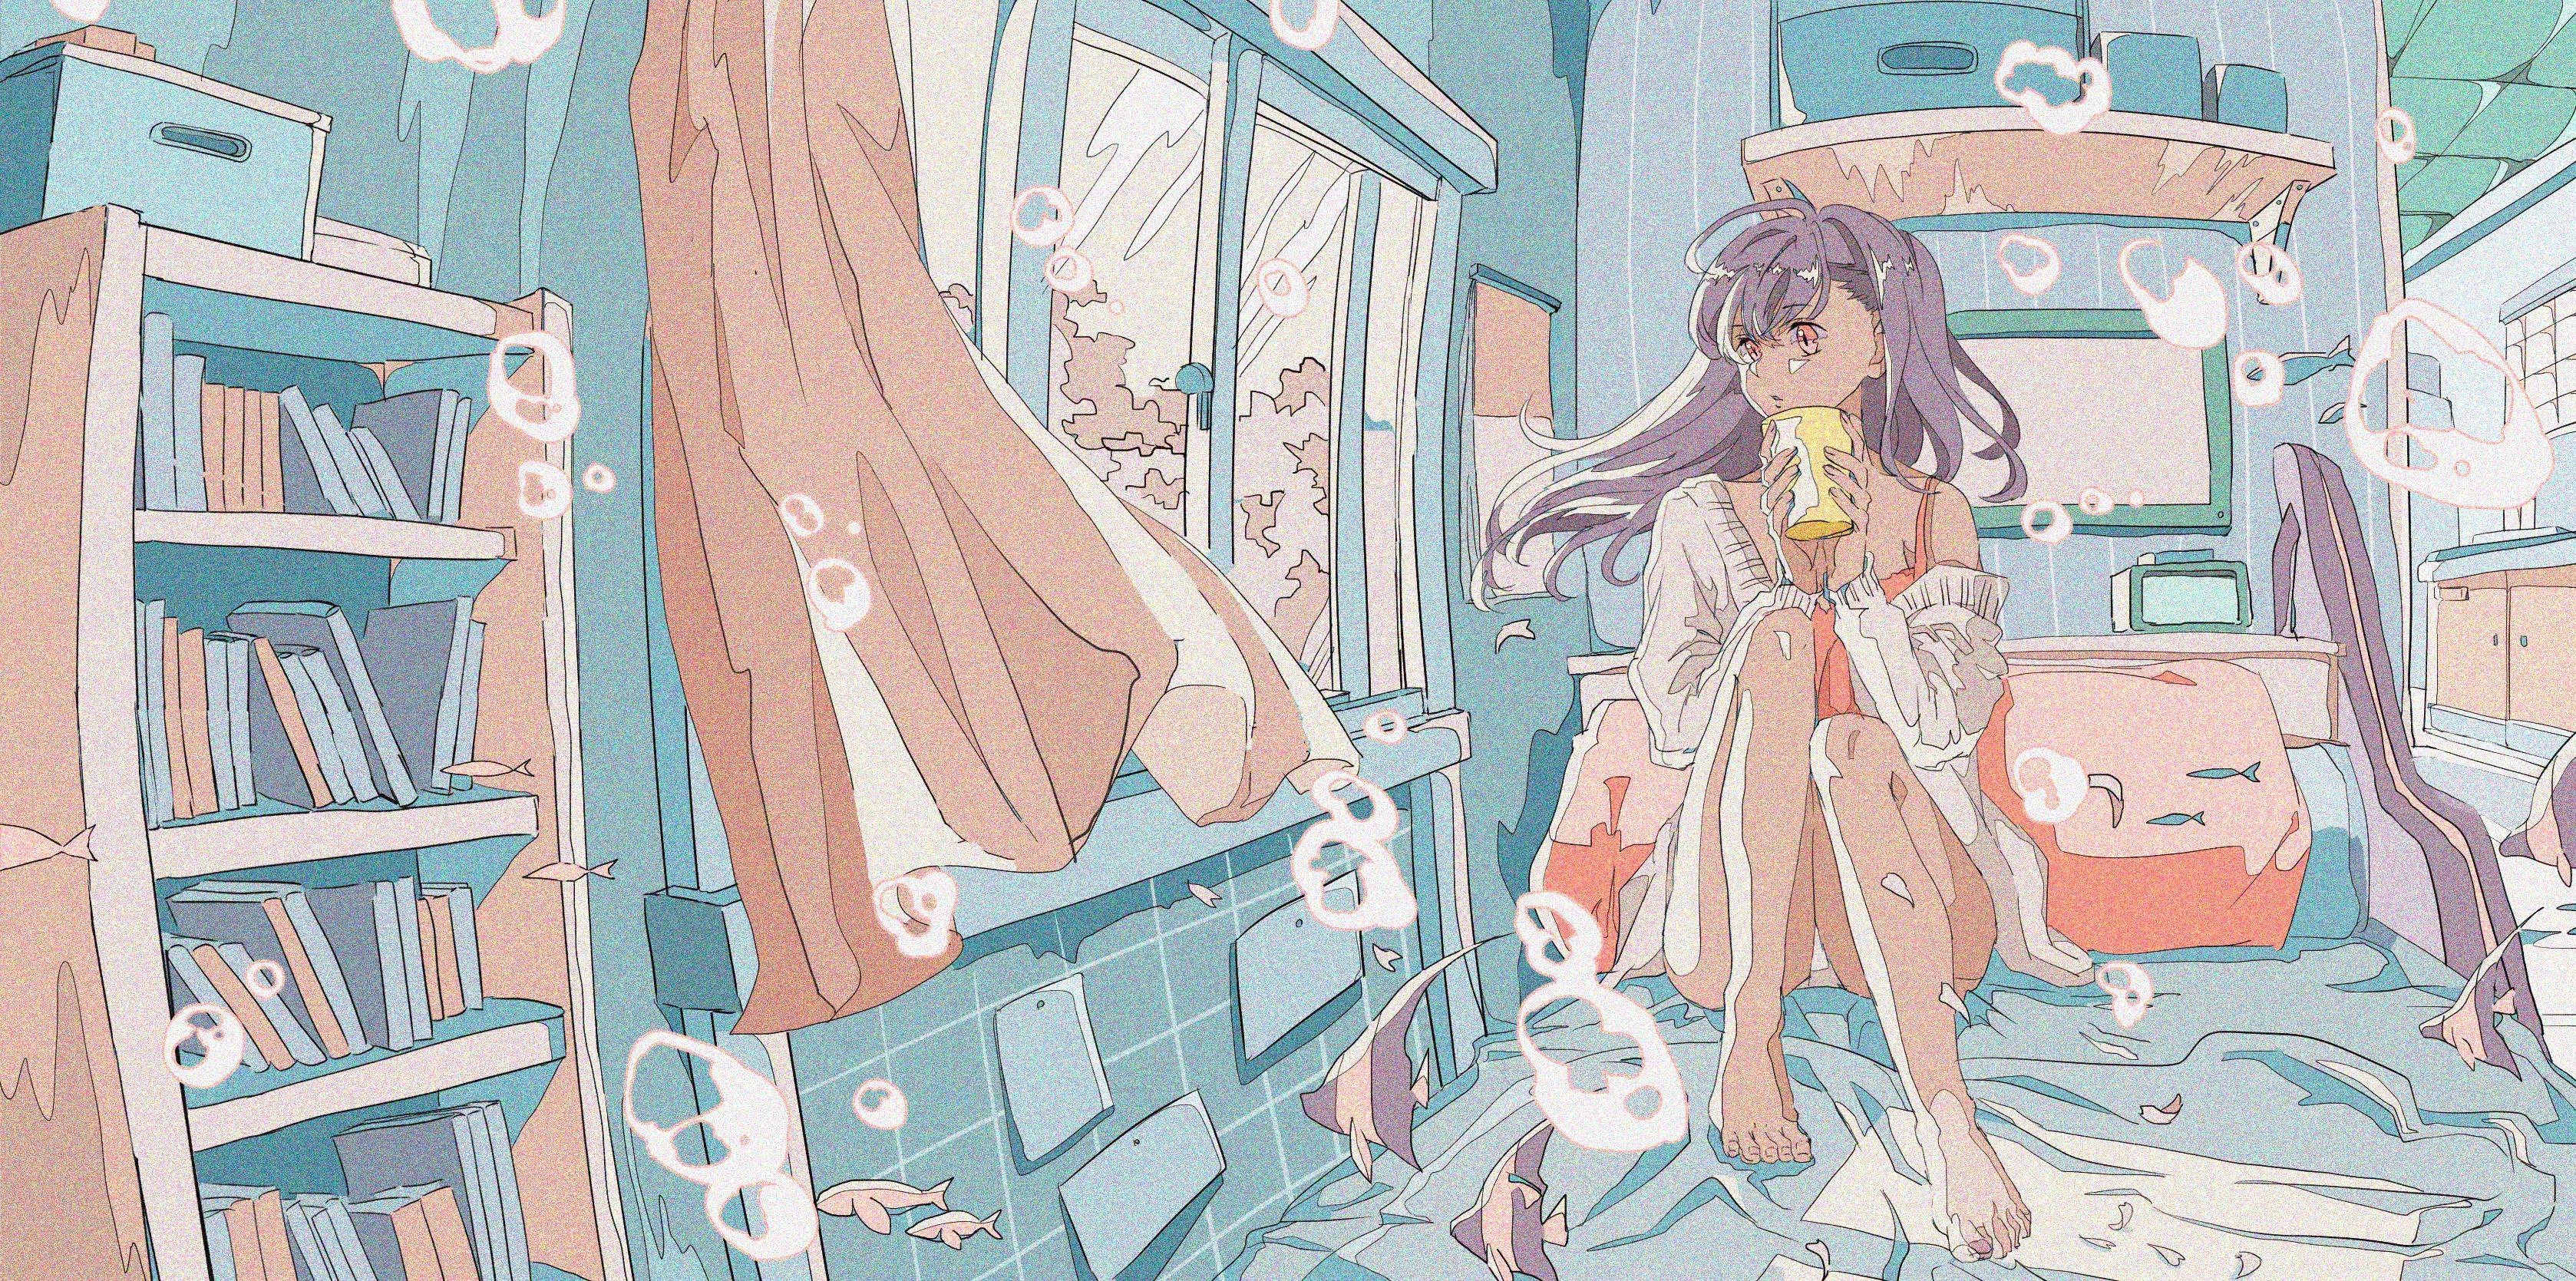 Pixiv日本画师いちご飴插画作品插图4